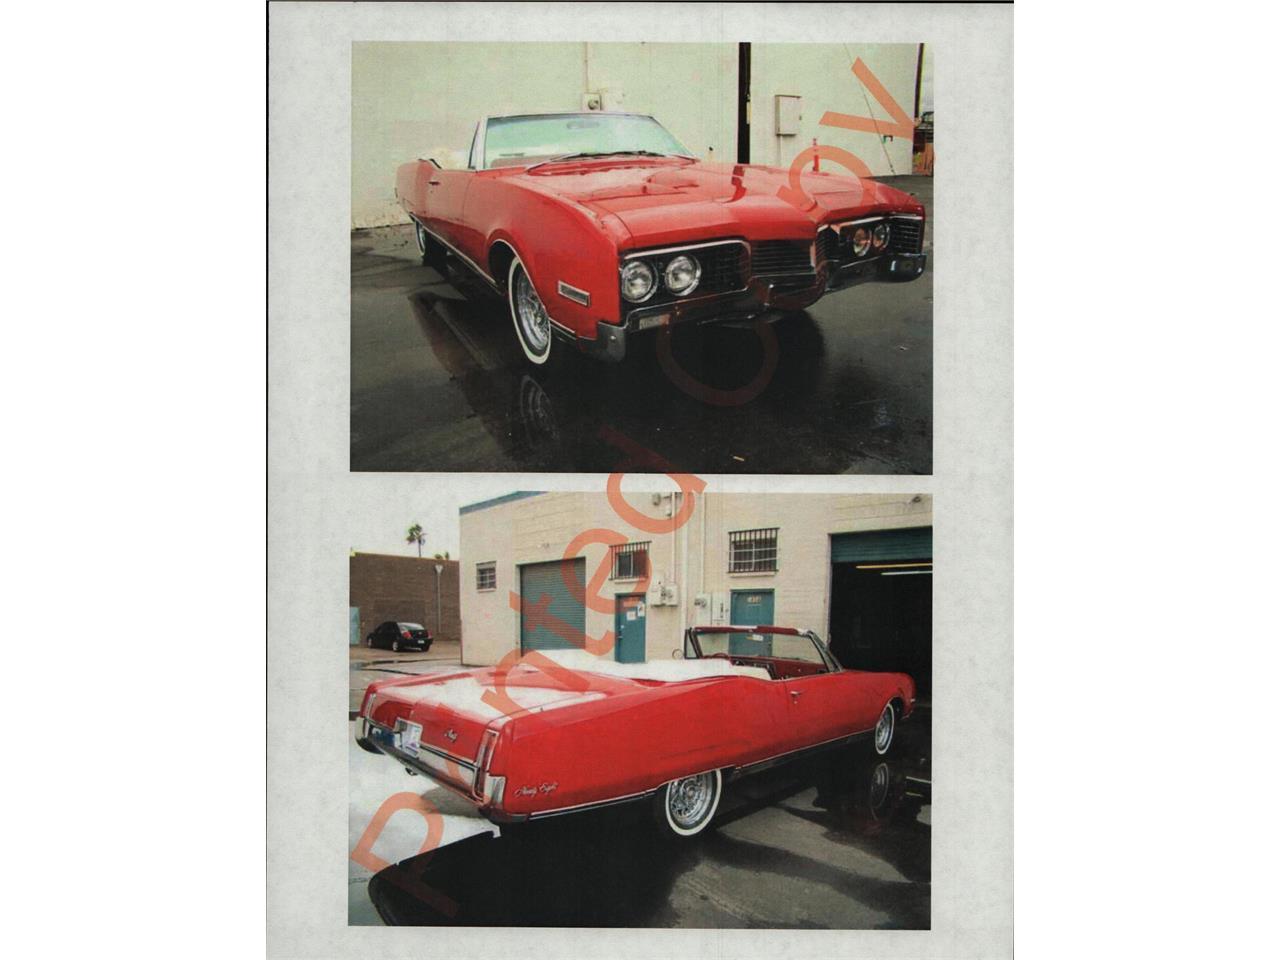 Large Picture of 1967 98 located in GILBERT Arizona - QIZI